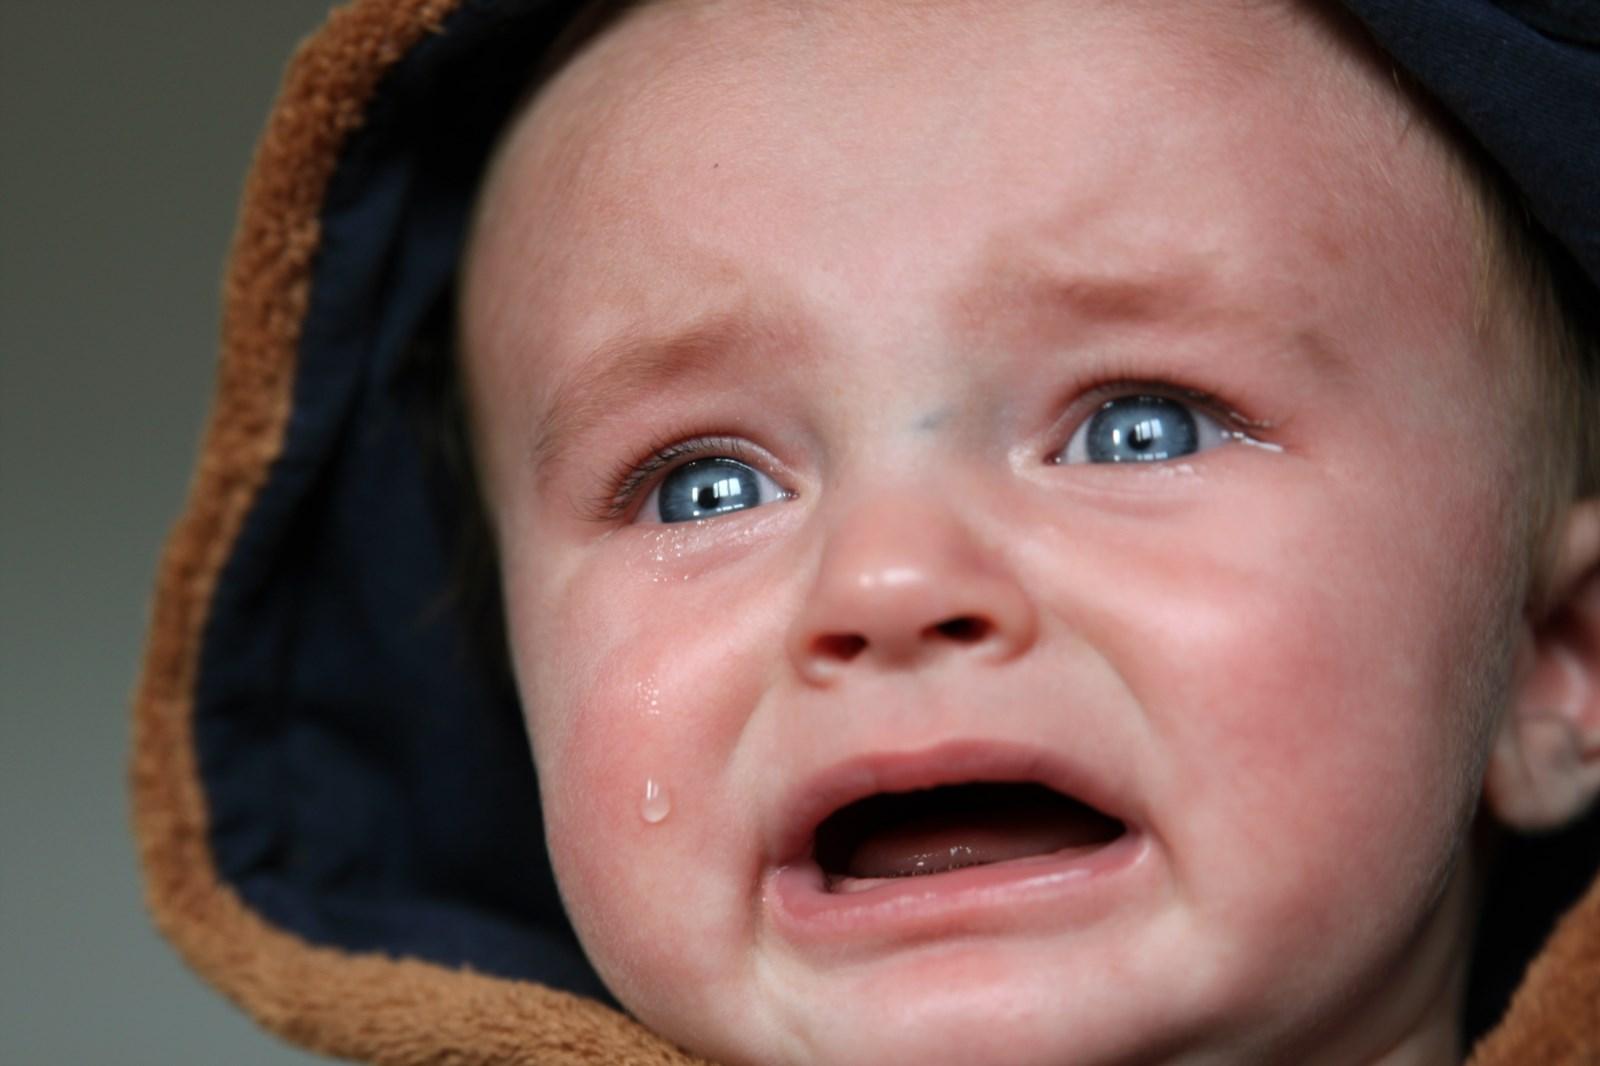 baby-child-close-up-crying-47090.jpg